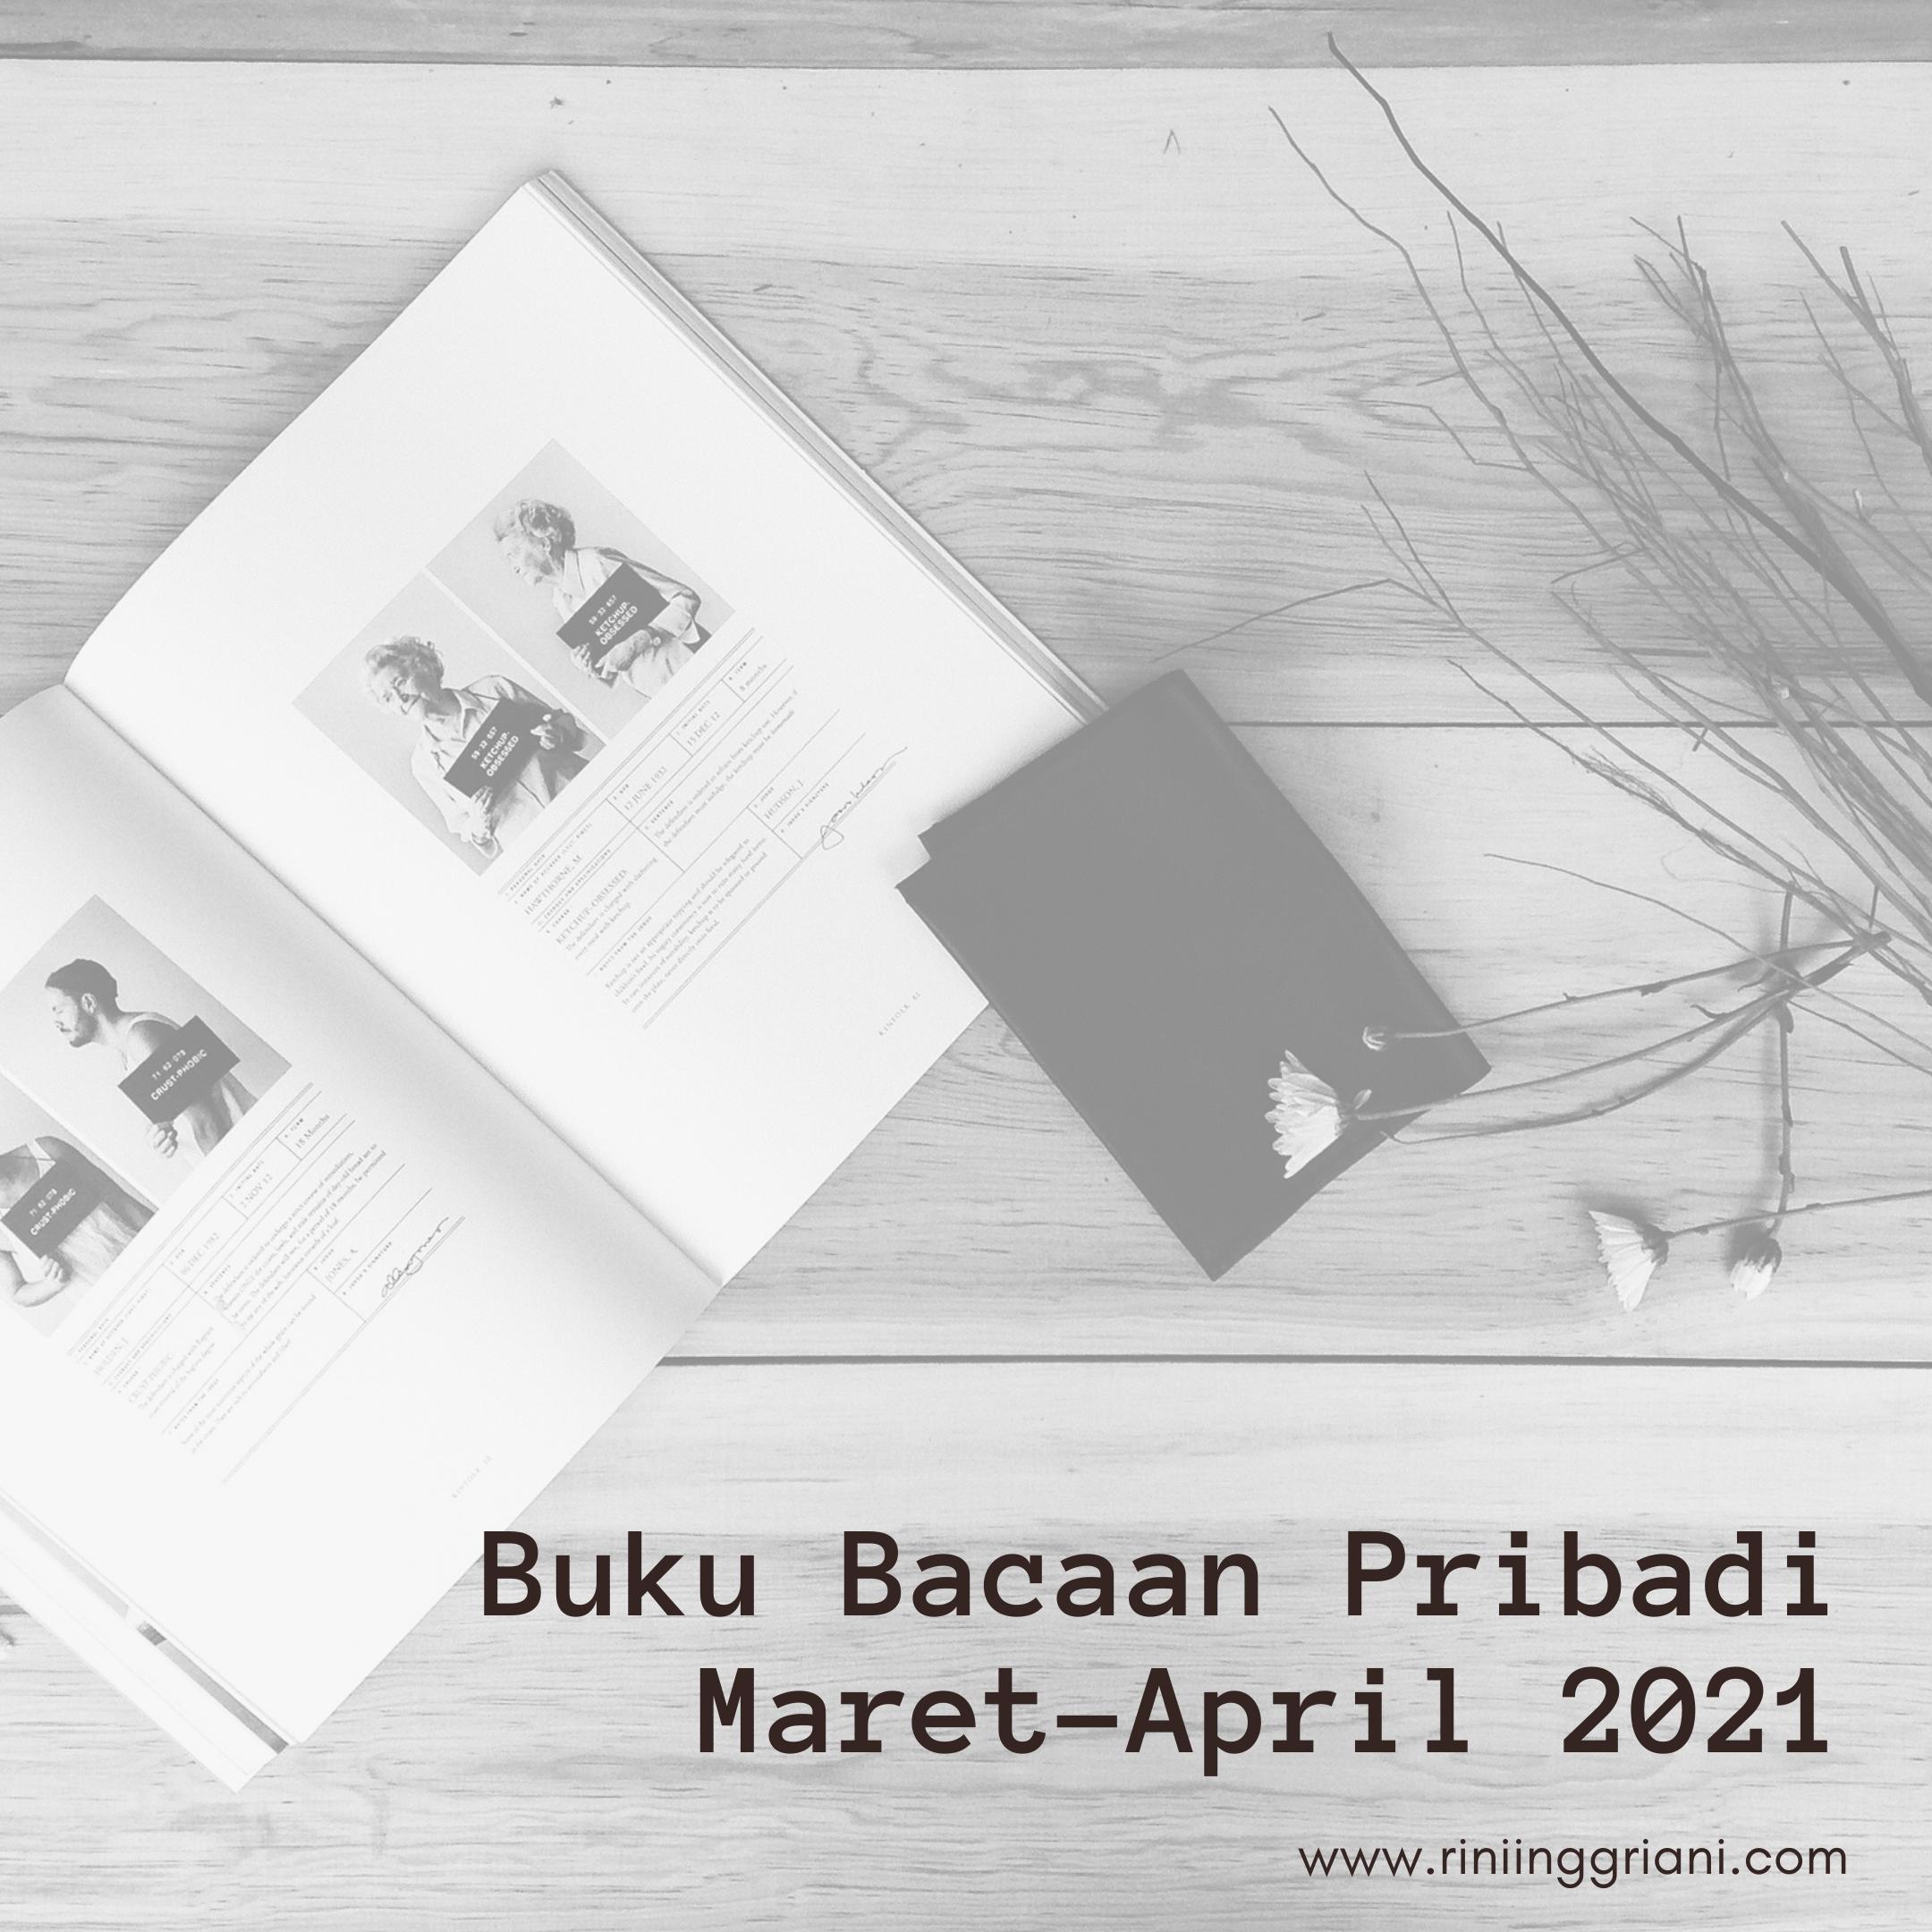 Buku Bacaan Pribadi Maret-April 2021